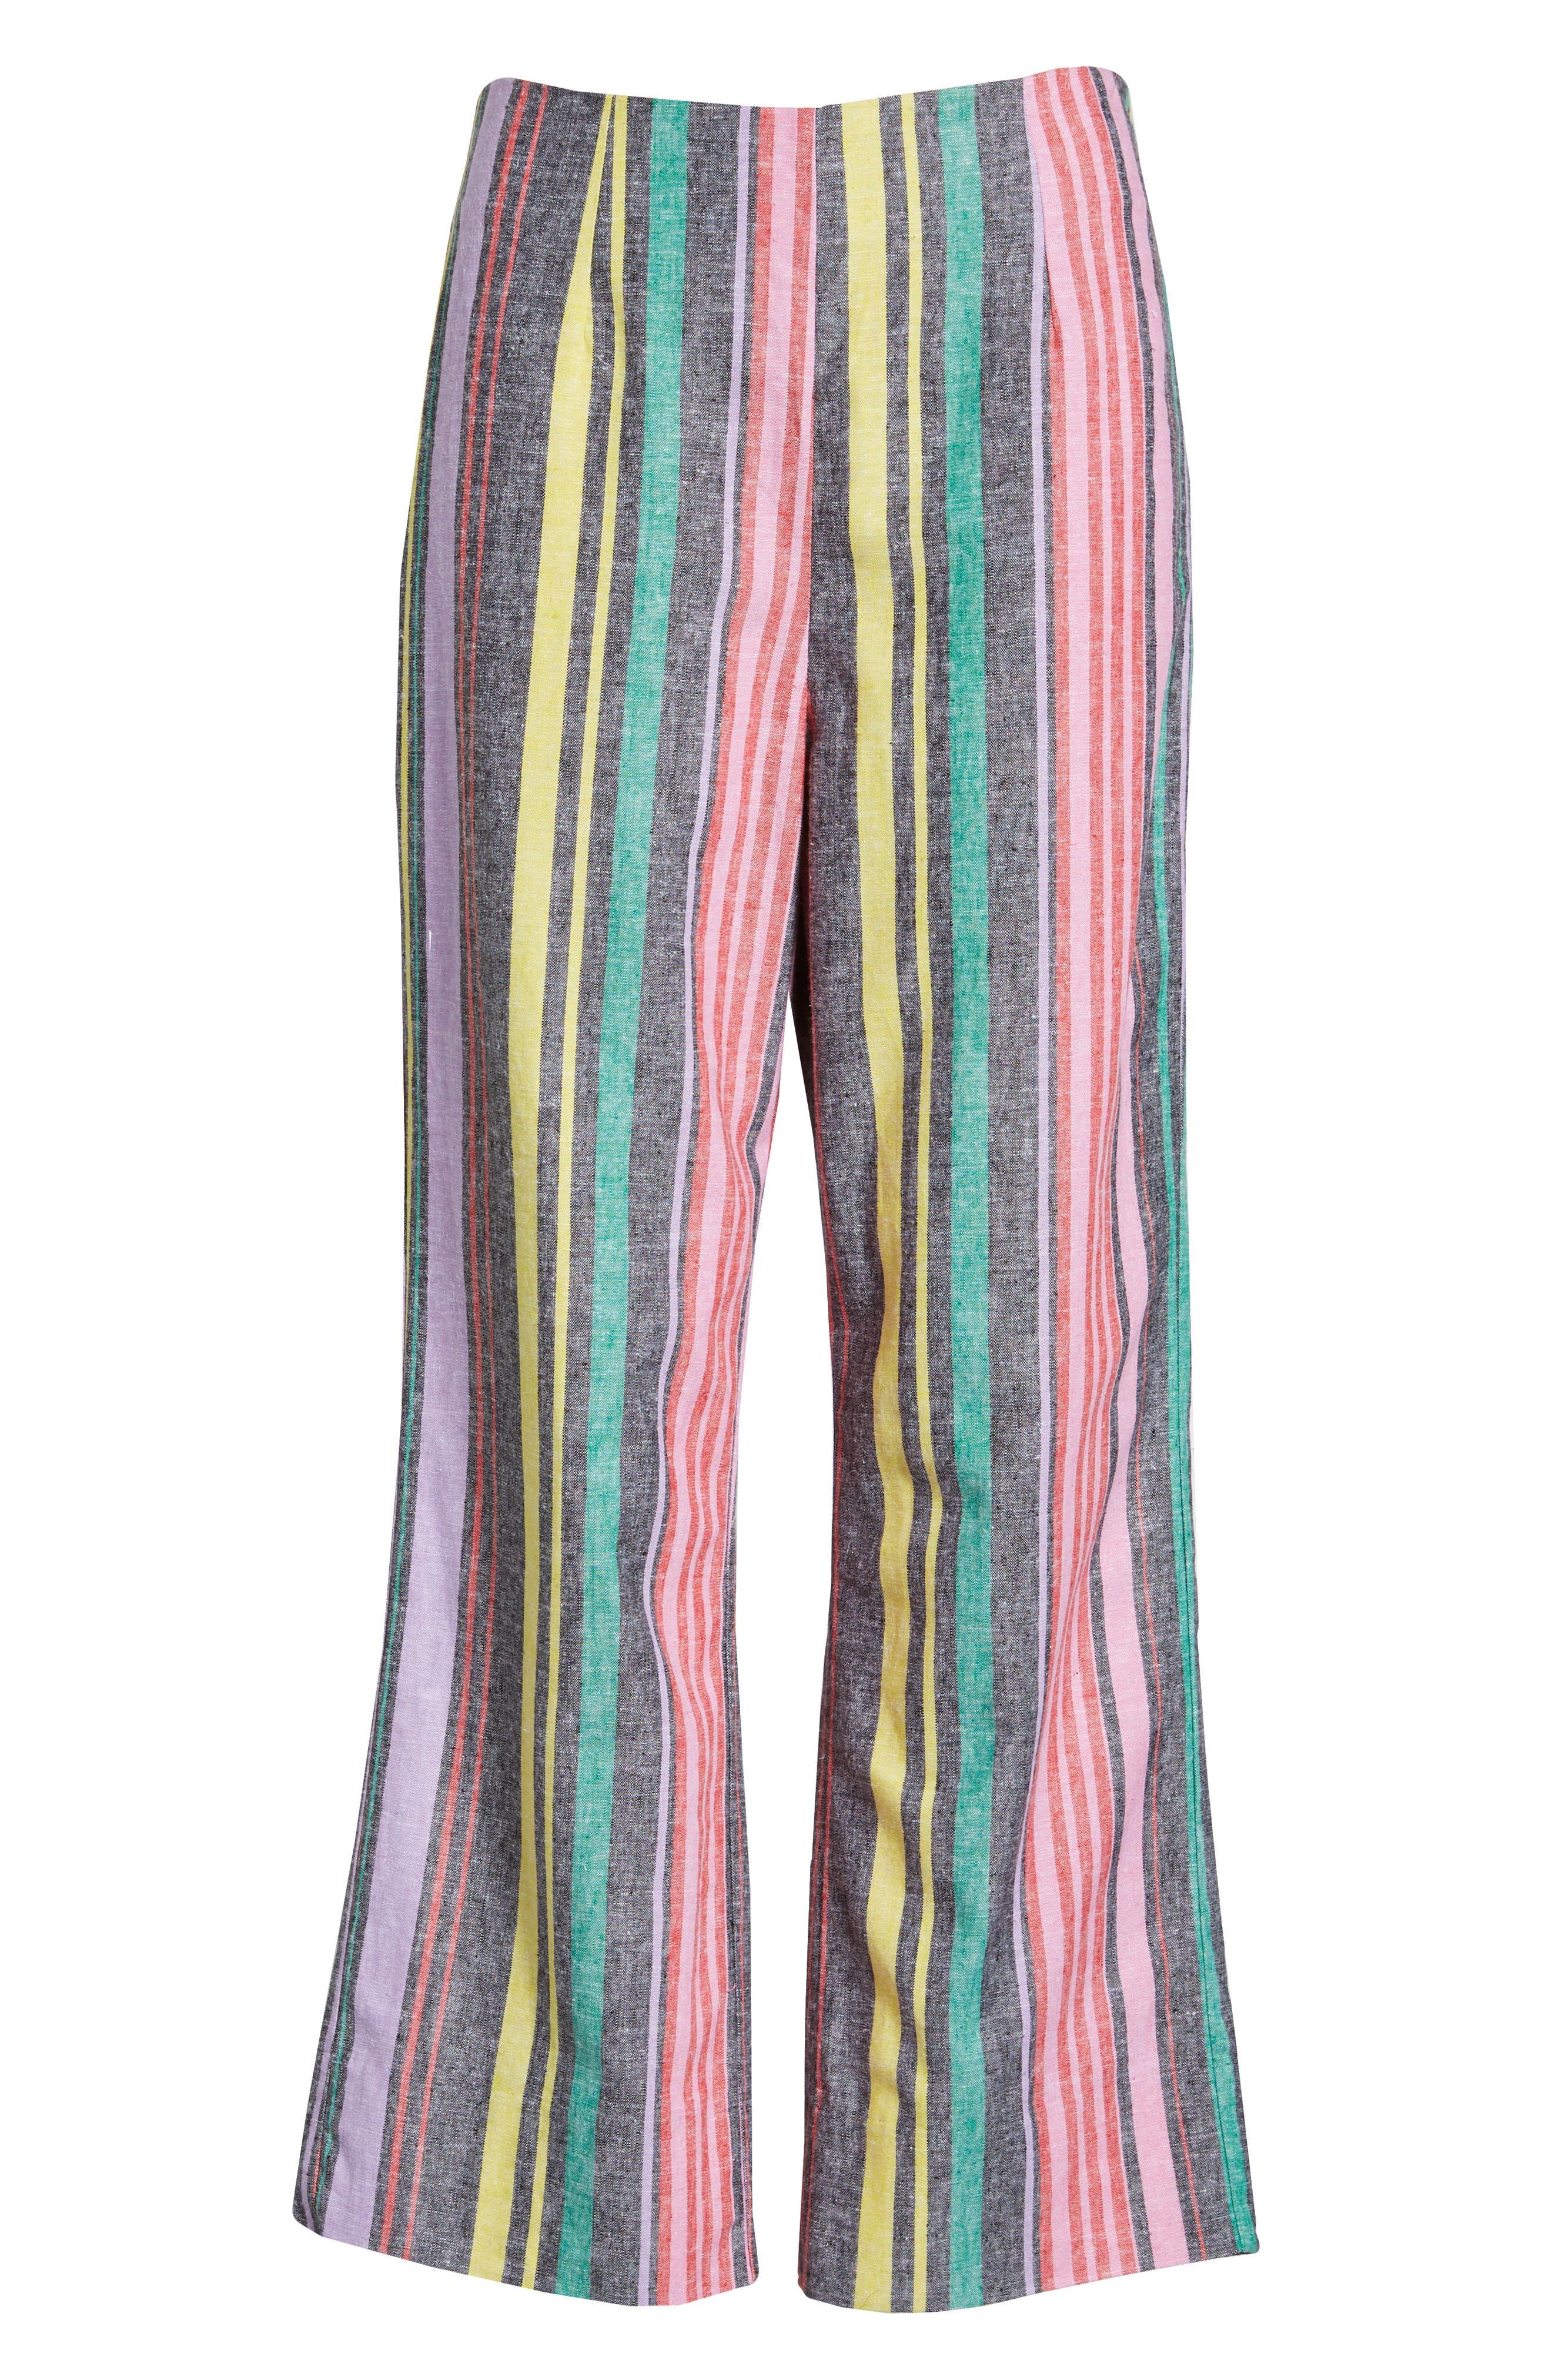 Karina High Waist Crop Flare Pant,                             Alternate thumbnail 8, color,                             Rainbow Stripe